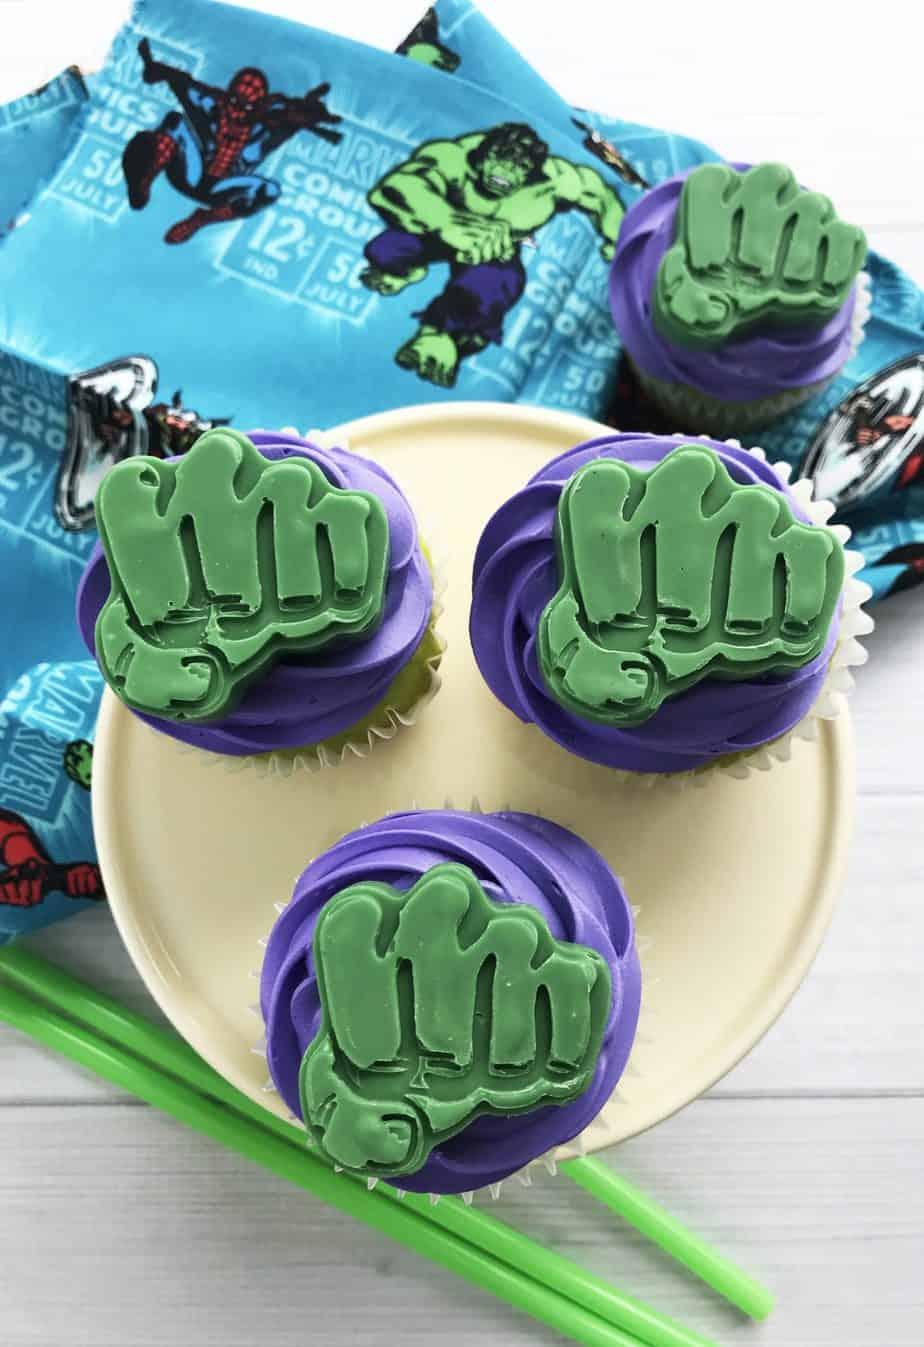 How To Make Adorable Incredible Hulk Cupcakes An Alli Event